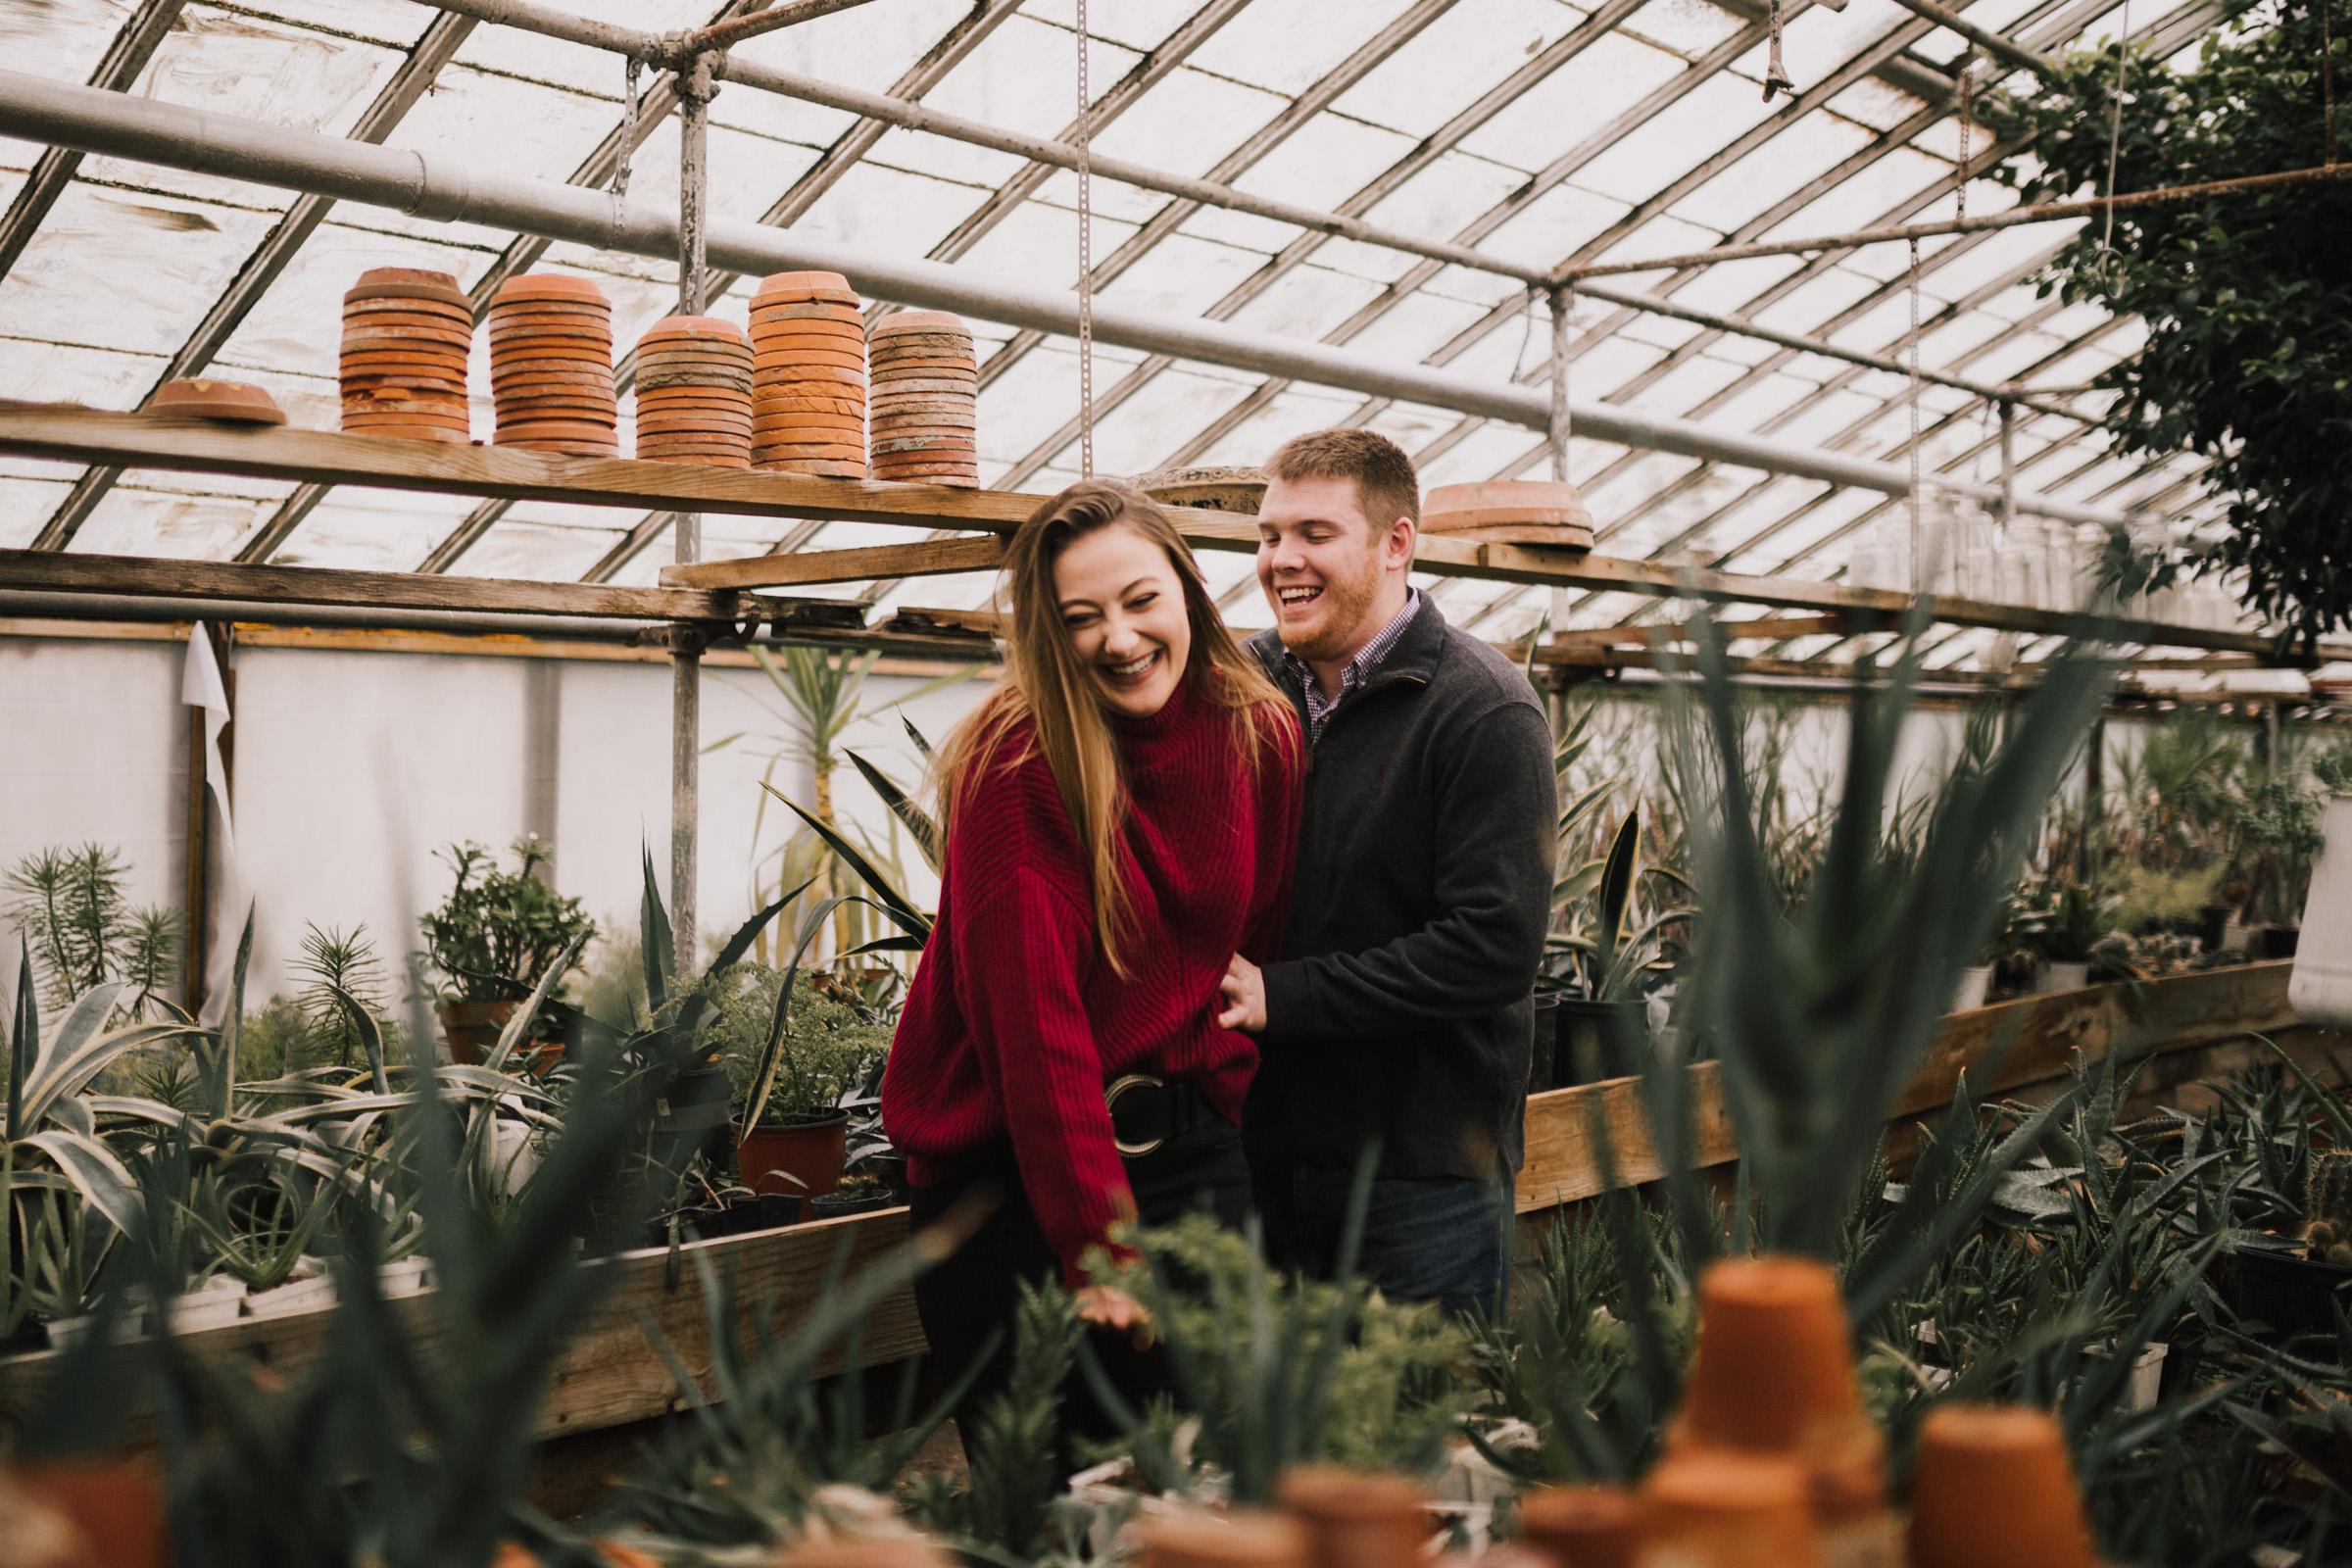 alyssa barletter photography johns greenhouse kansas city missouri brookside waldo engagement session winter-9.jpg